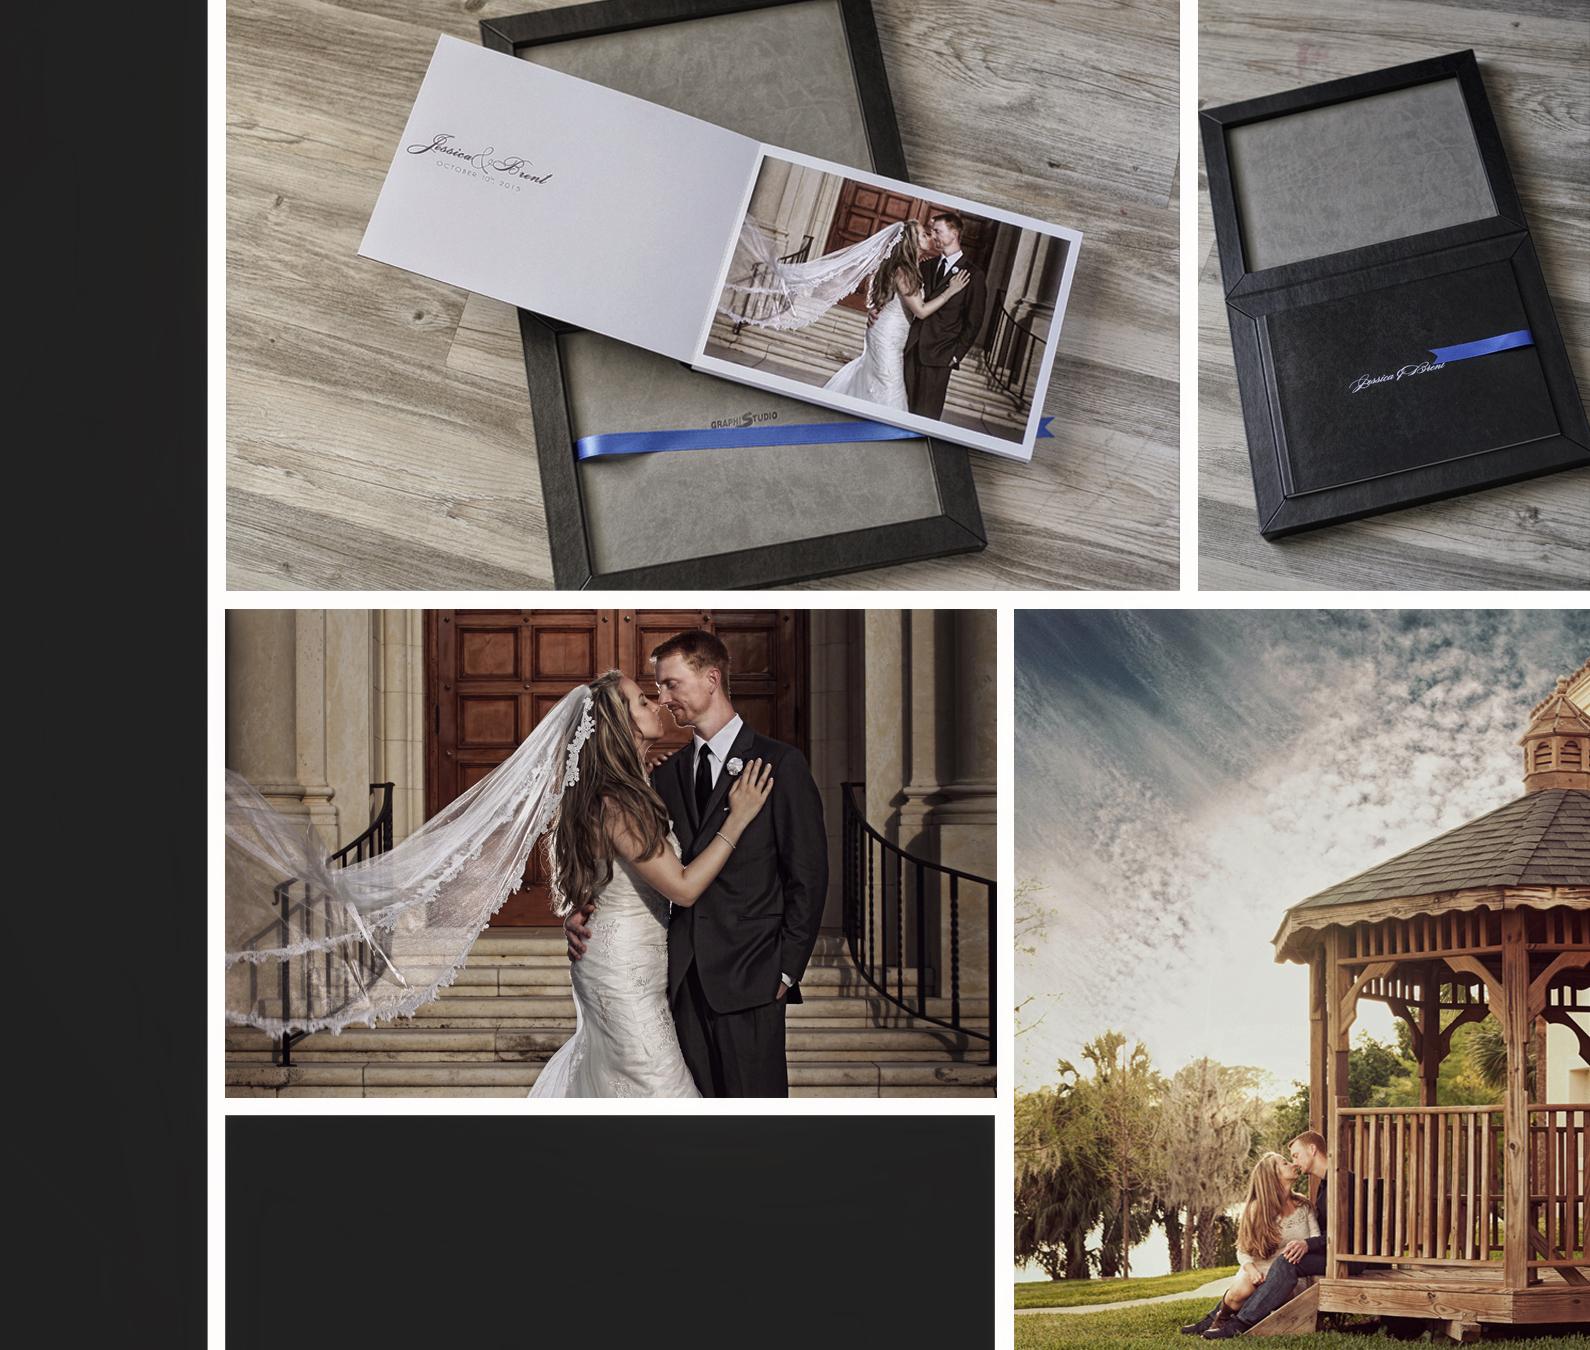 02-windemere-wedding-photographer-modern-artistic-album.jpg